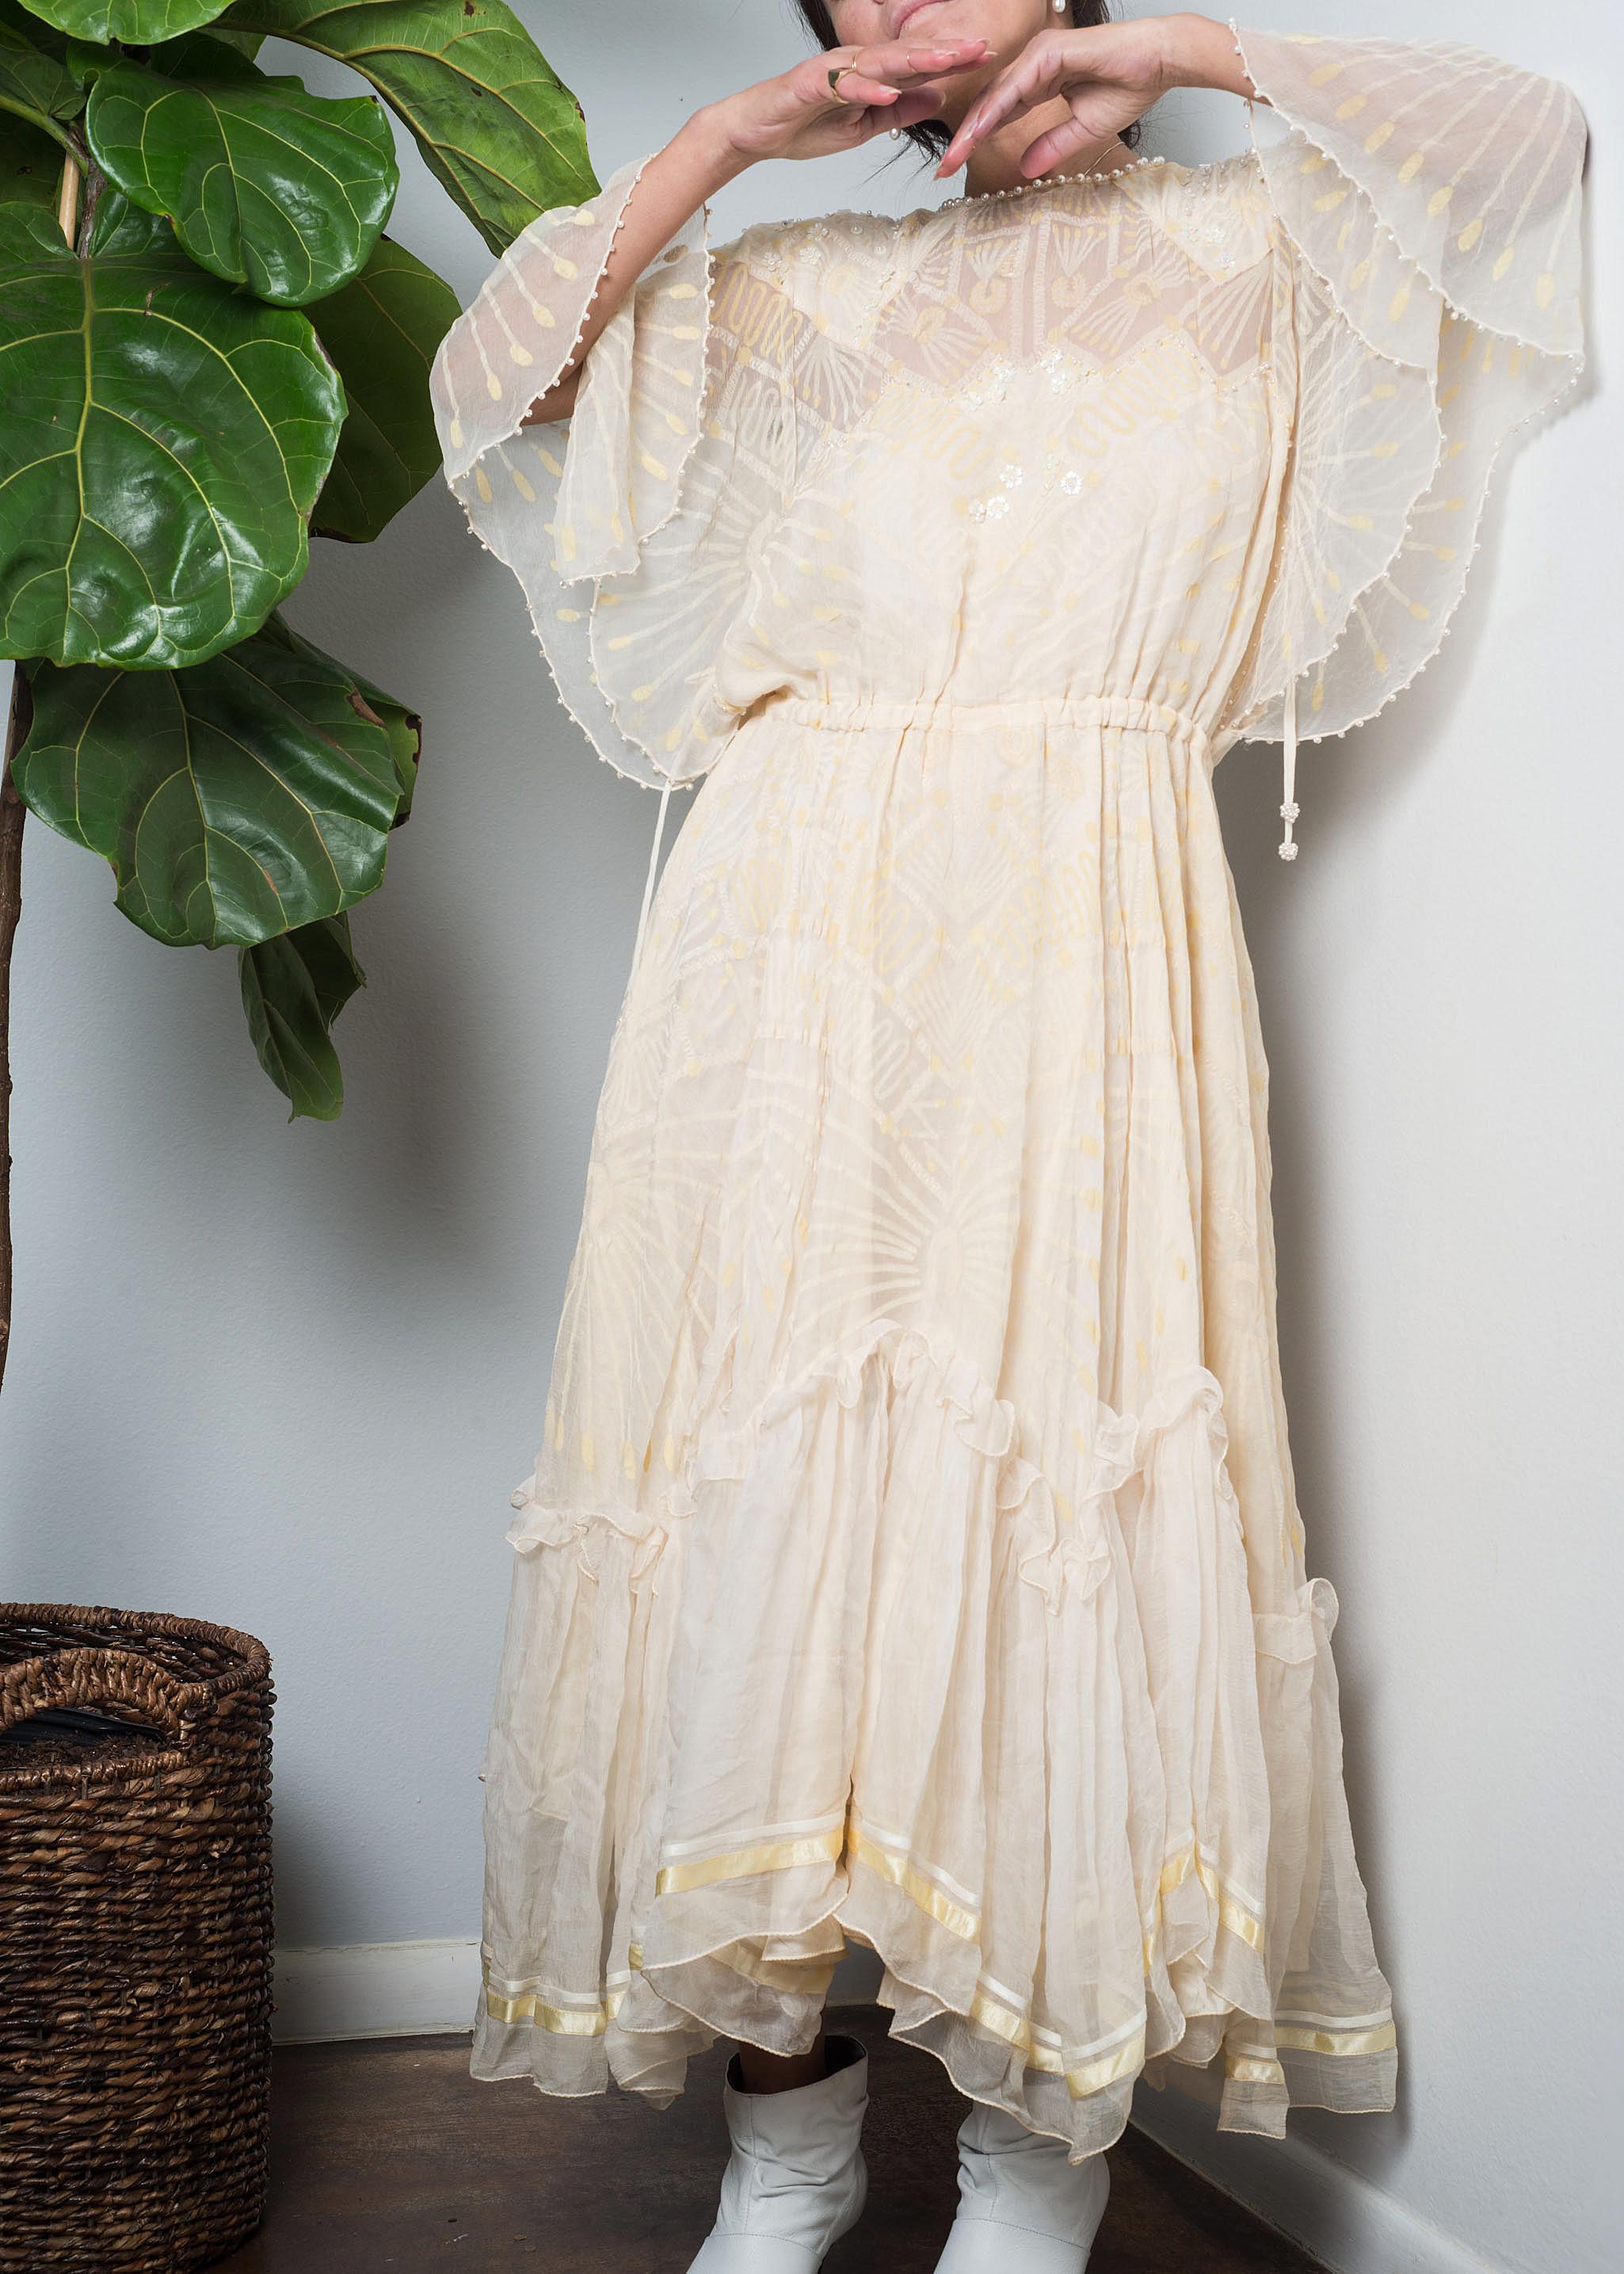 A_Part_of_the_Rest_Vintage_1980s_zandra_rhodes_hand_painted_bead_chiffon_dress_001.jpg